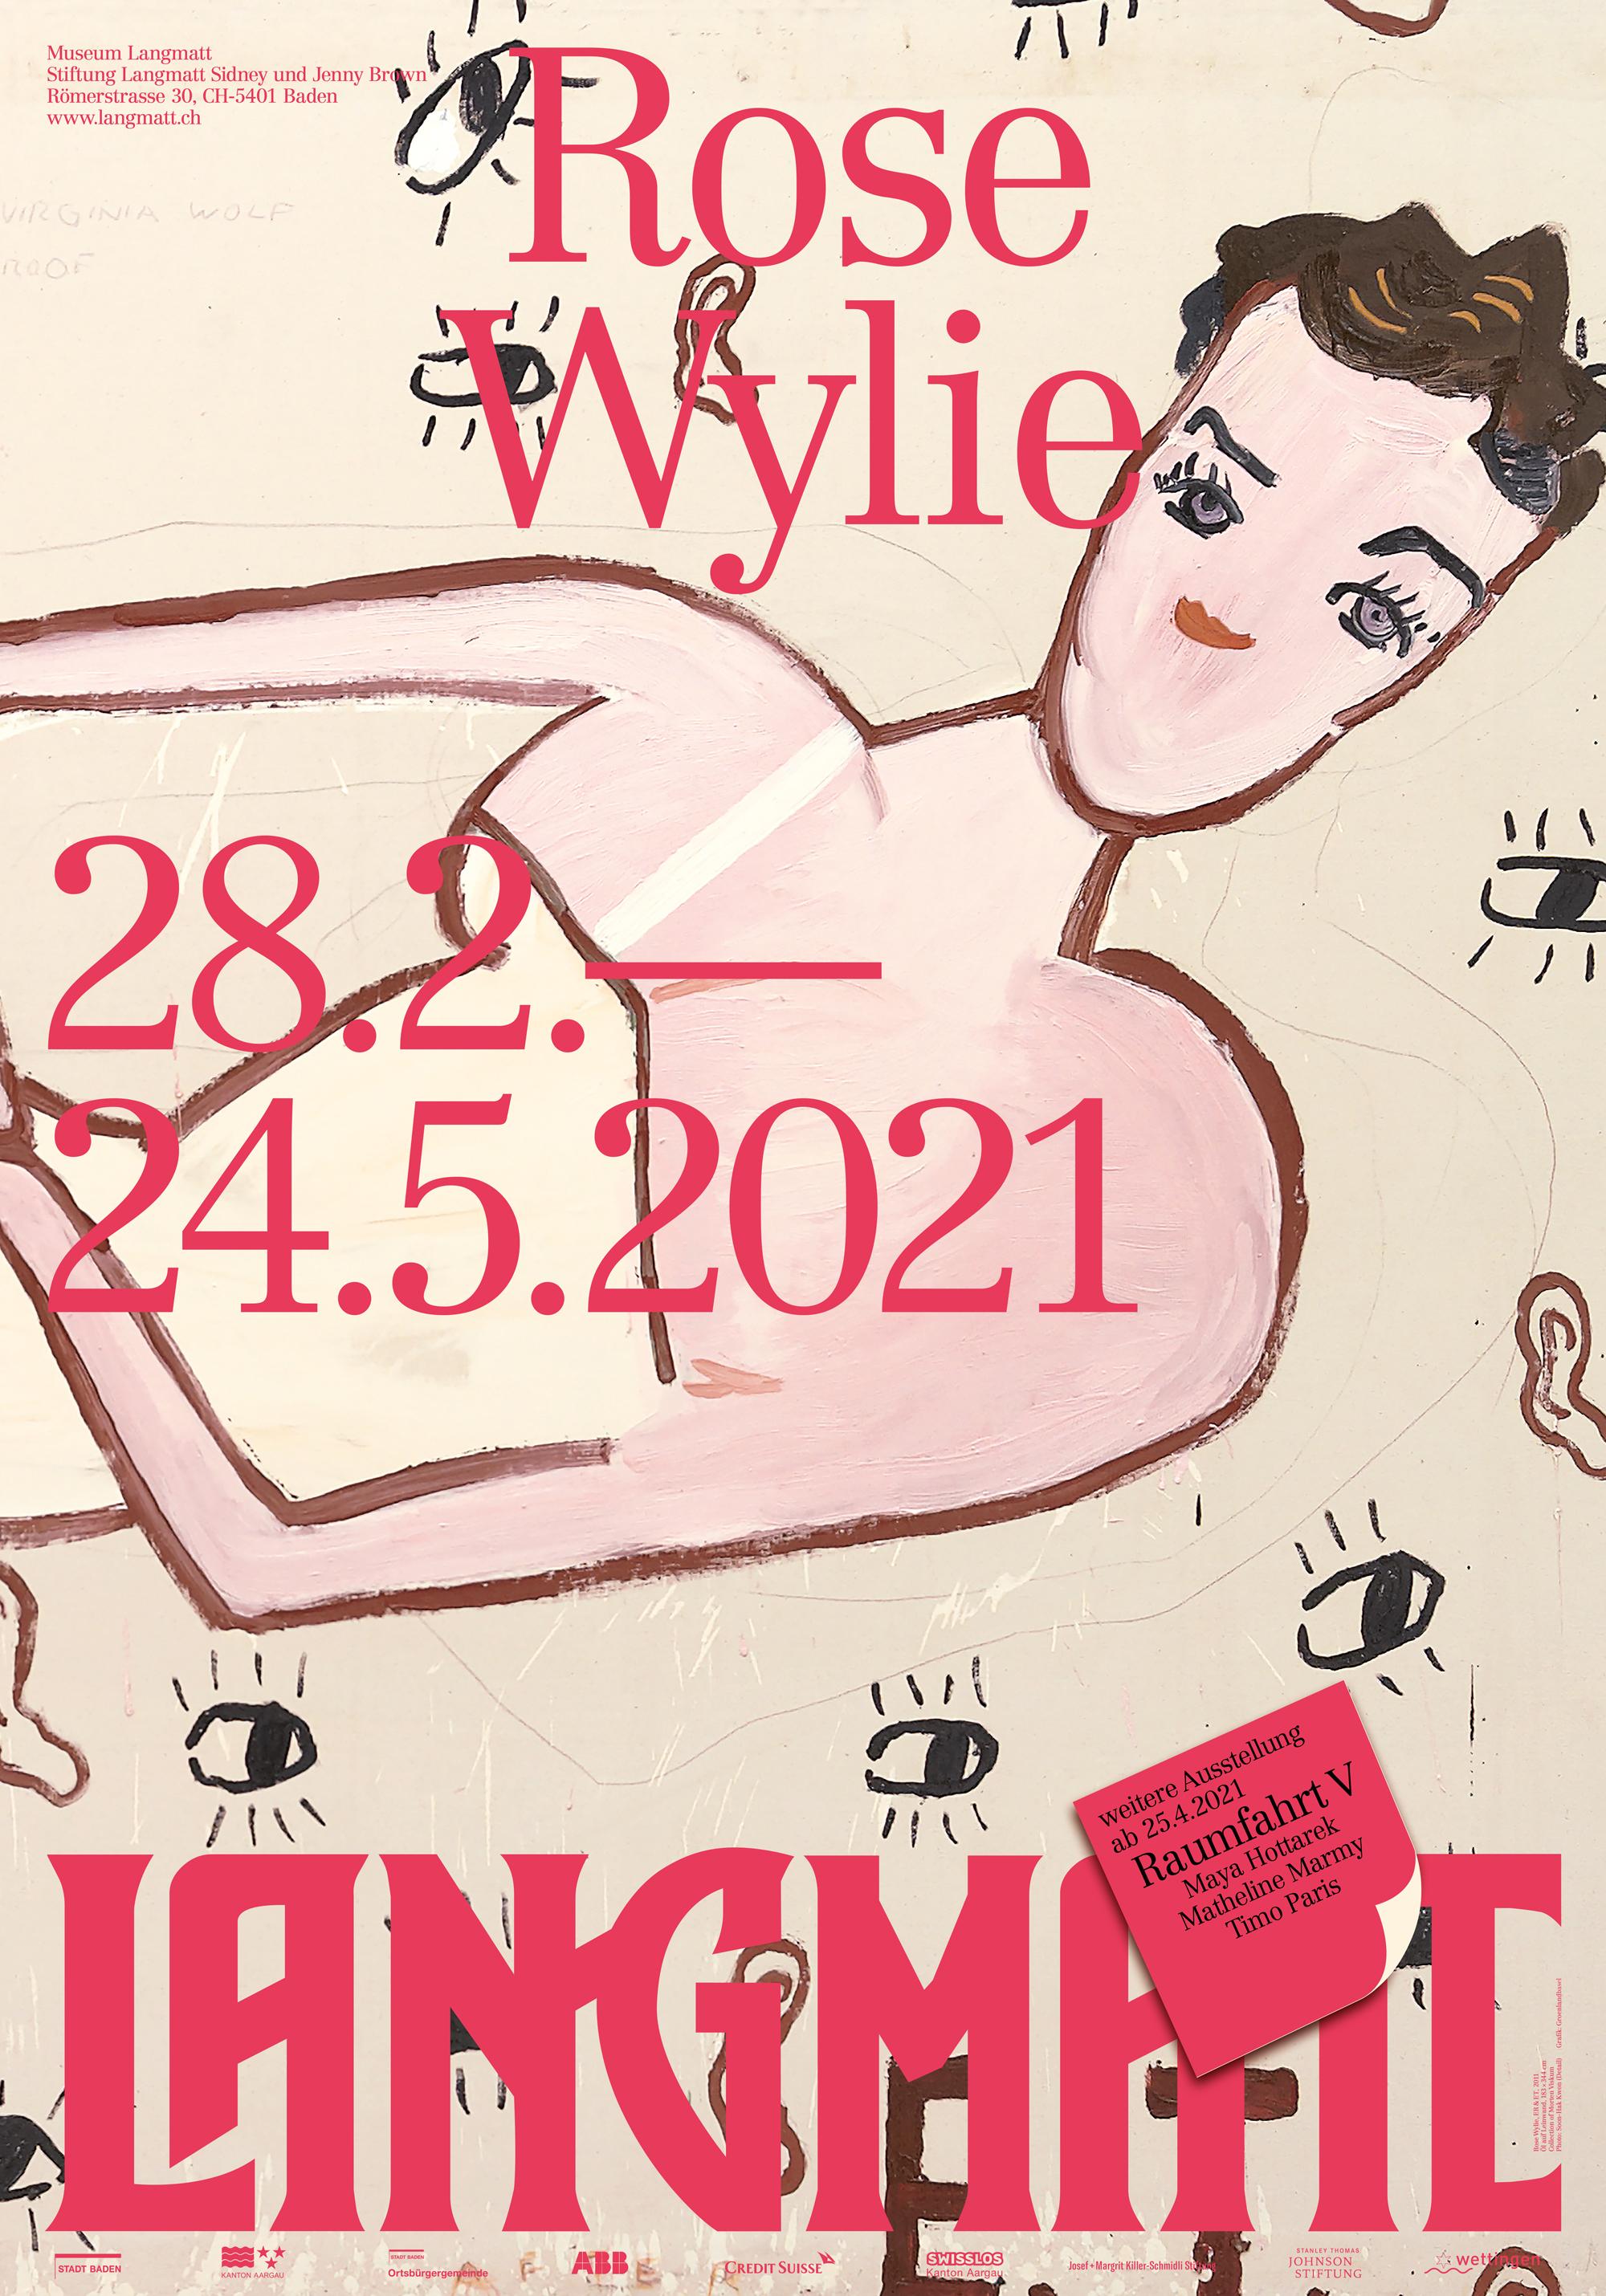 201222 Langmatt Rose Wylie Plakat F4 Rz Low